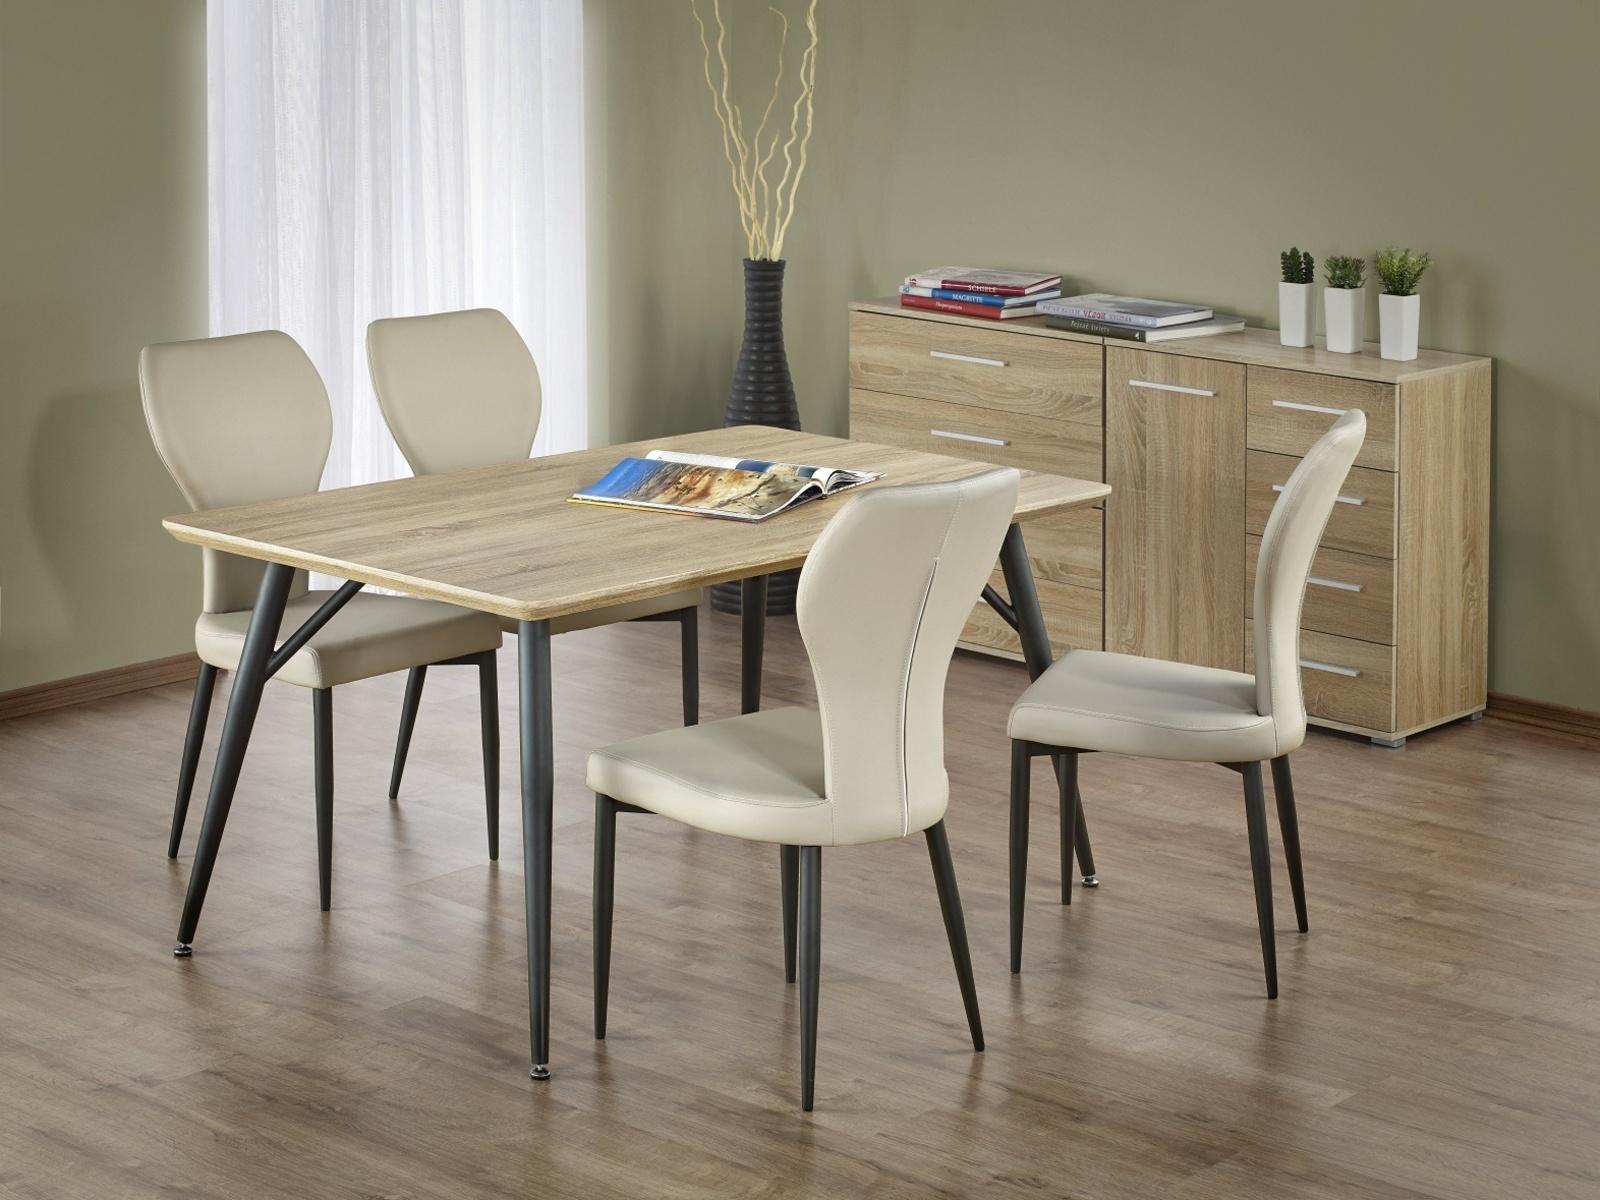 Halmar FABIO jídelní stůl, dub sonoma/černá